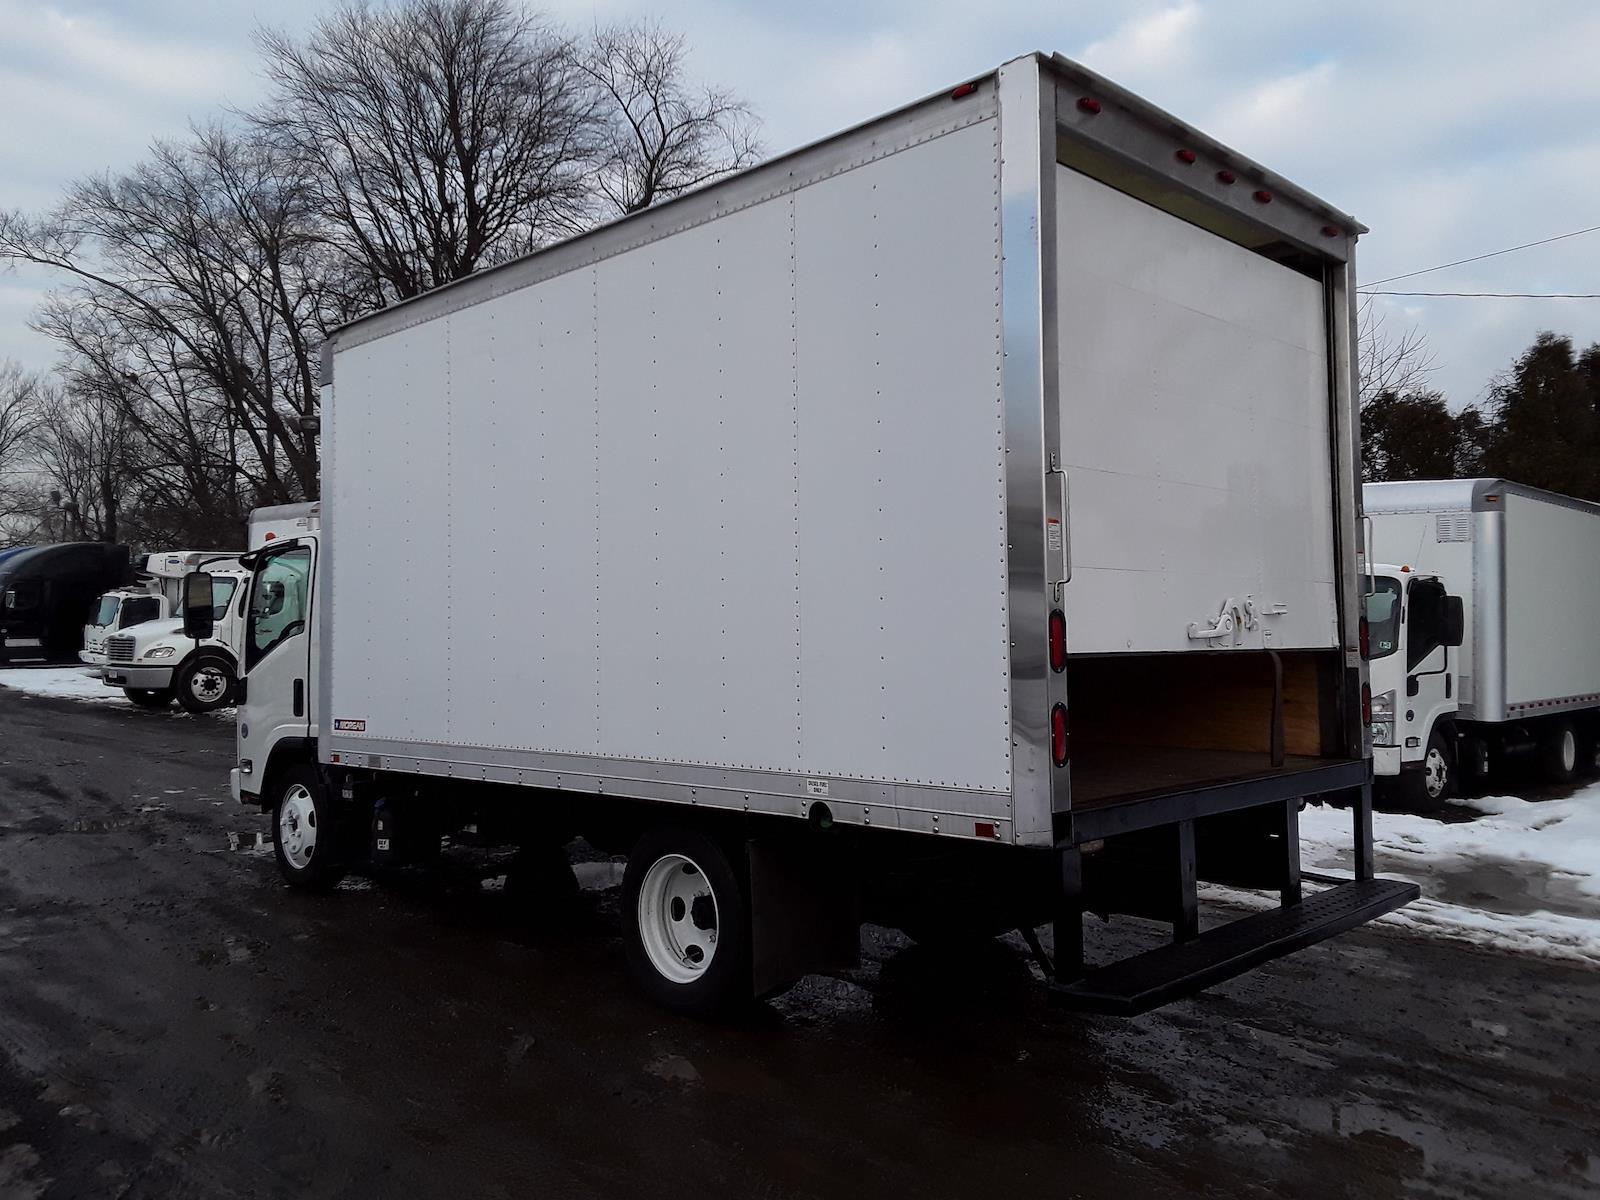 2015 Isuzu NQR Regular Cab 4x2, Dry Freight #329169 - photo 1